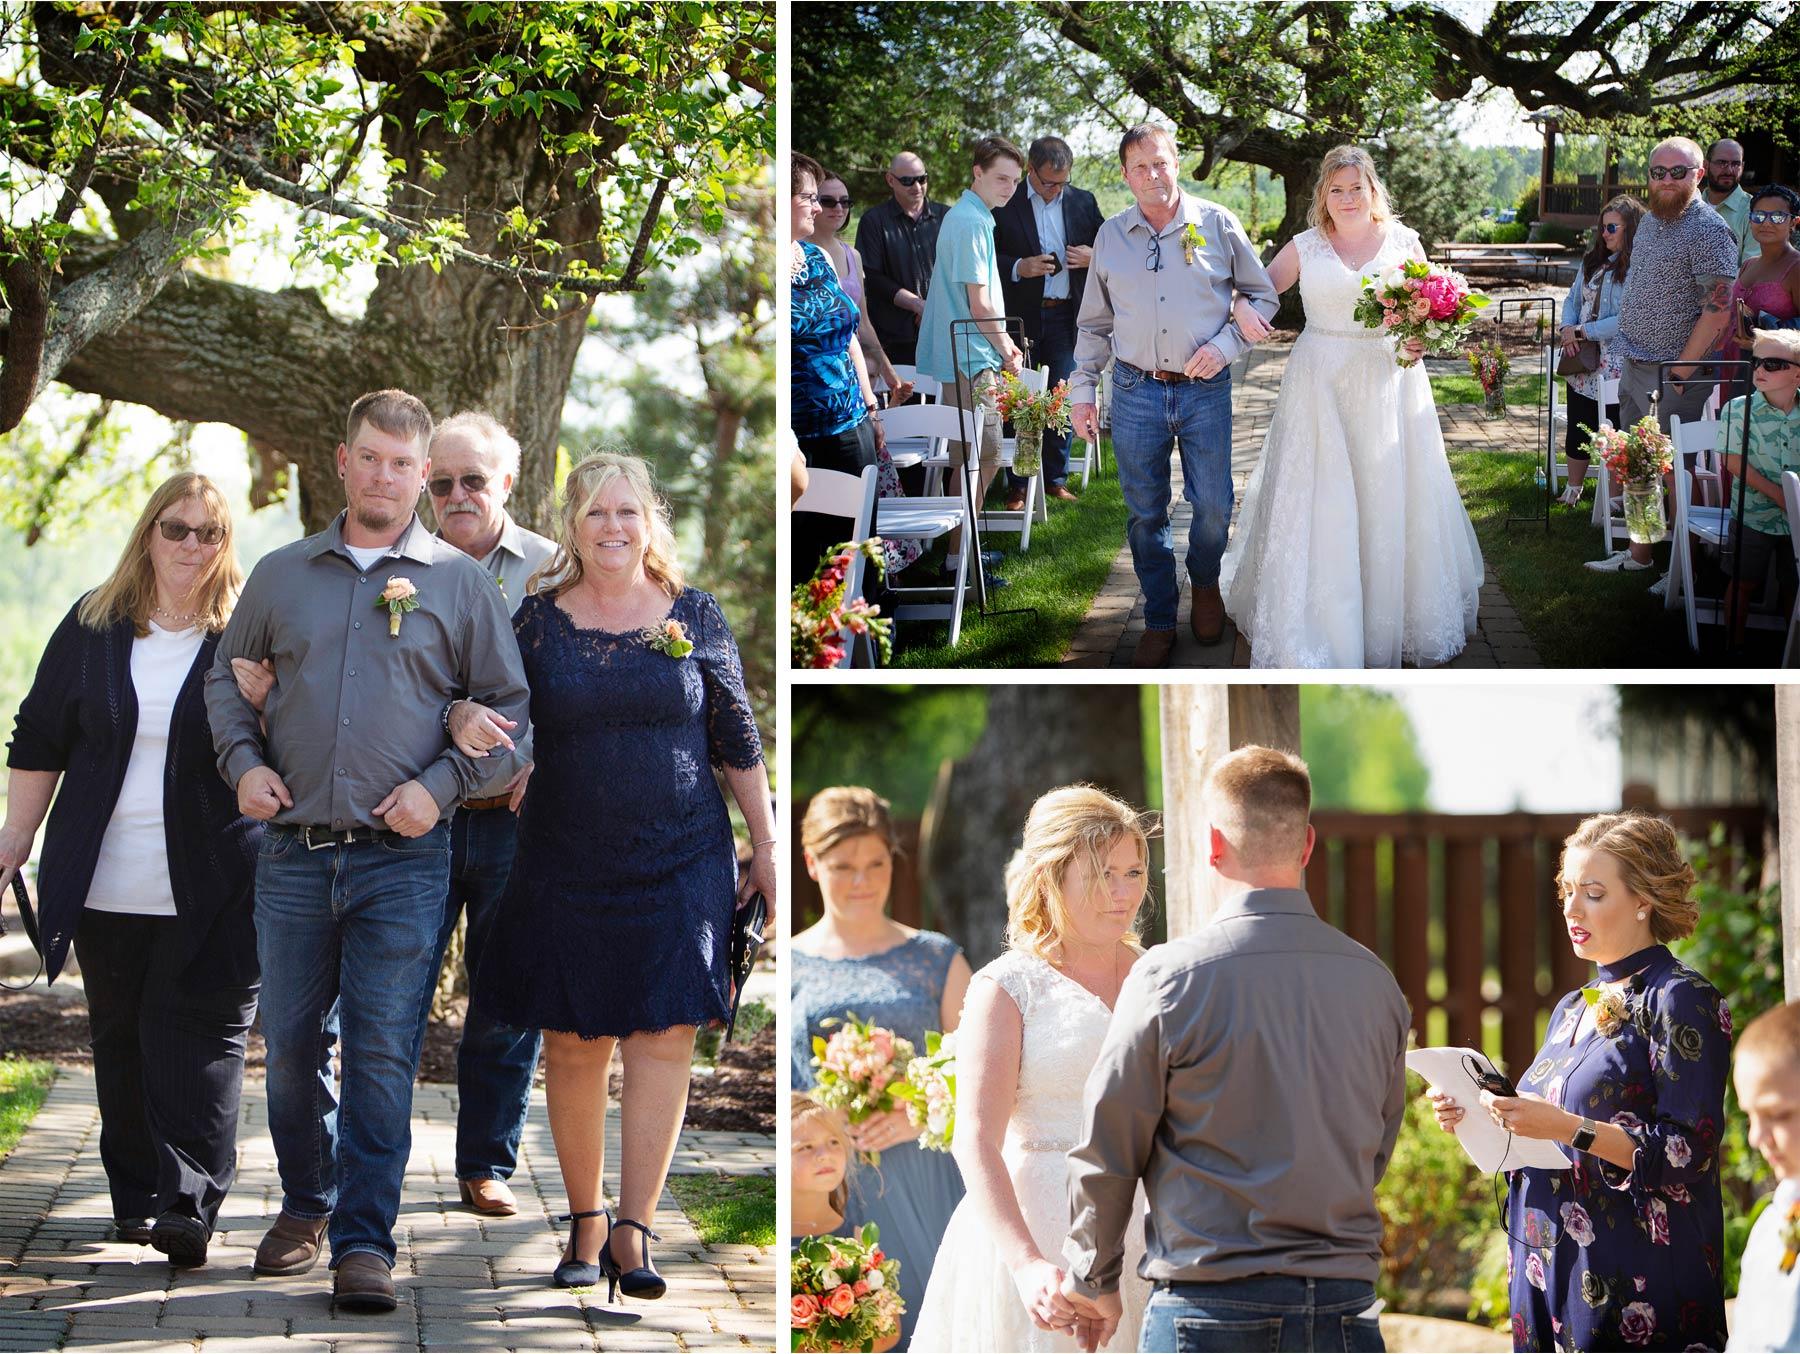 07-Vick-Photography-Wedding-Brainerd-Minnesota-Pine-Peaks-Lodge-Cabin-Rustic-Outdoor-Ceremony-Kristi-and-Noel.jpg